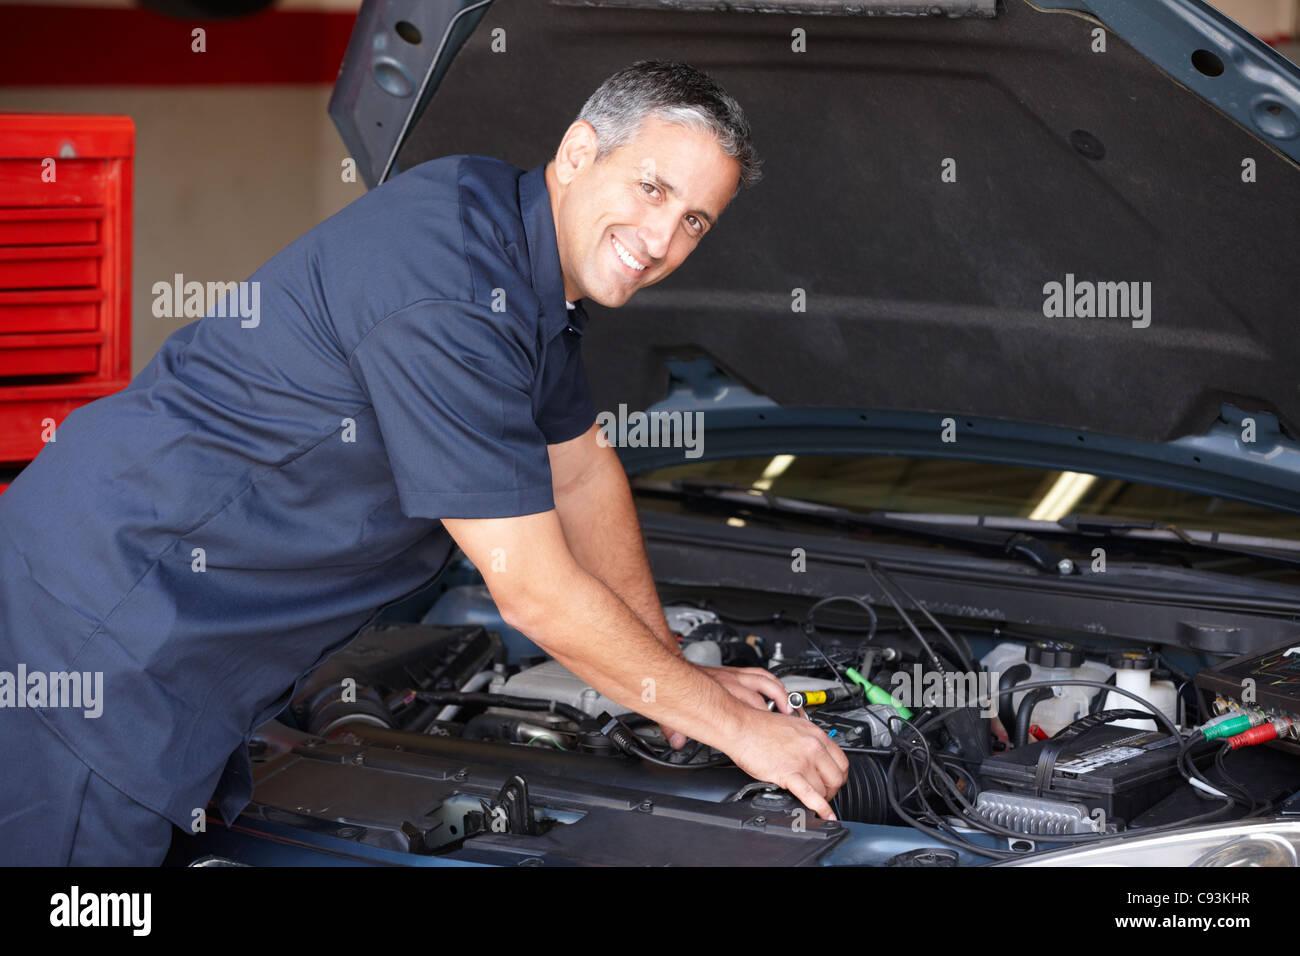 Mechanic at work - Stock Image